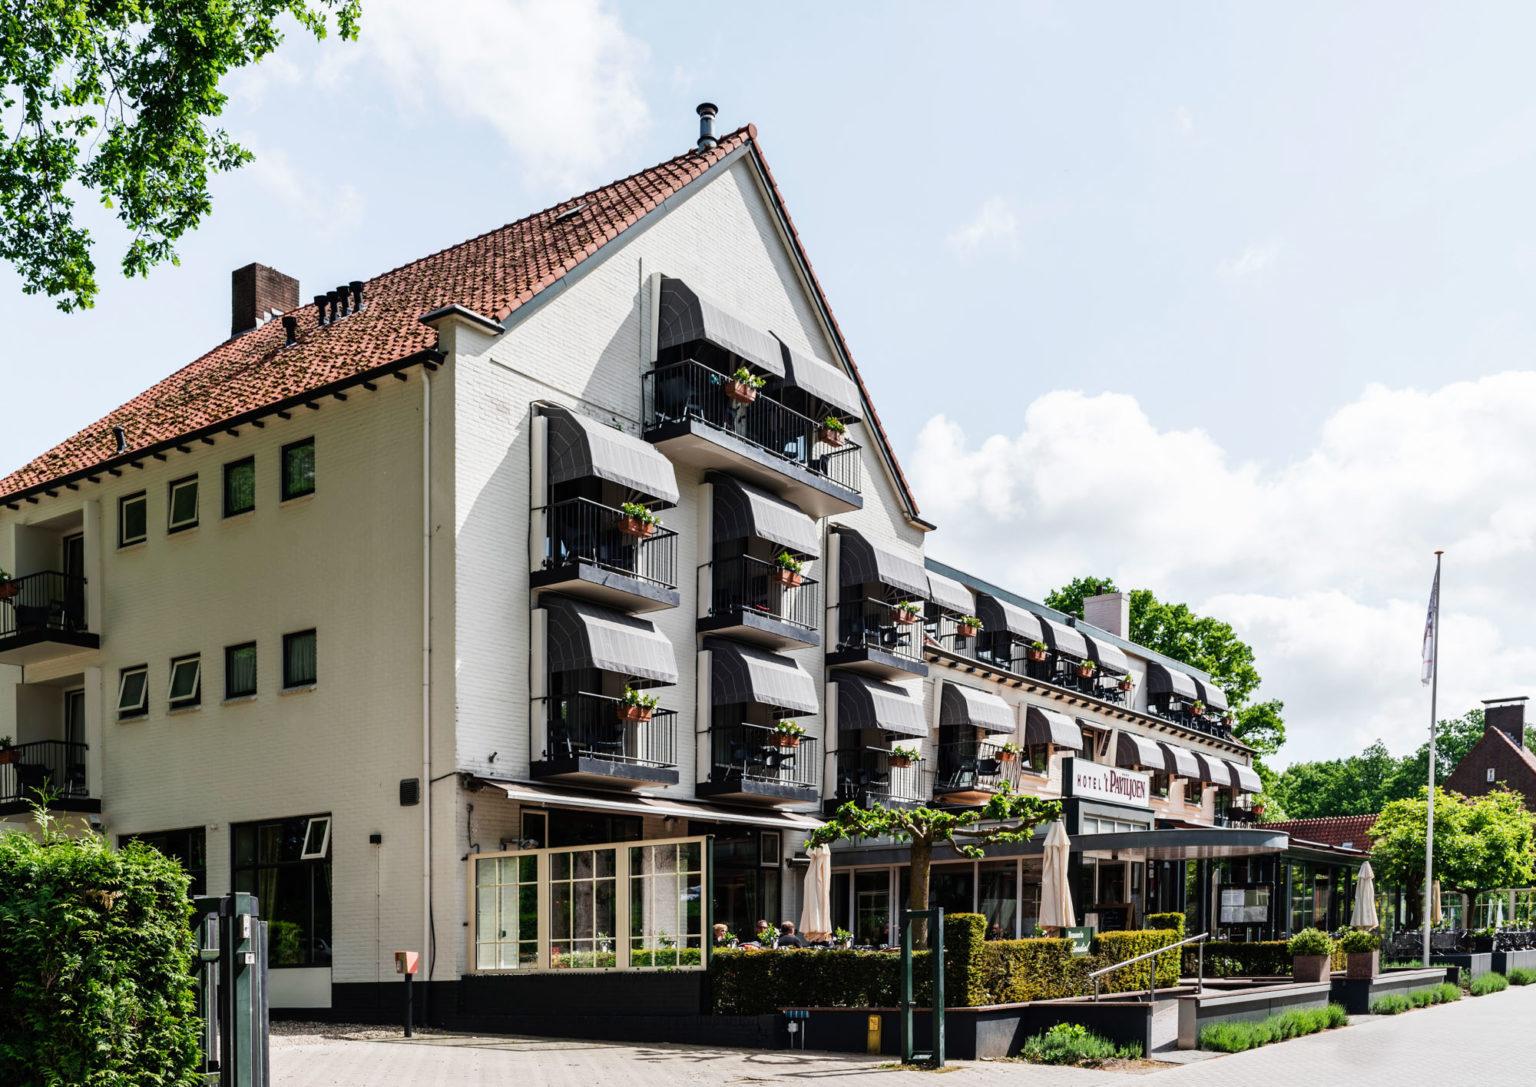 Paviljoen Hotel